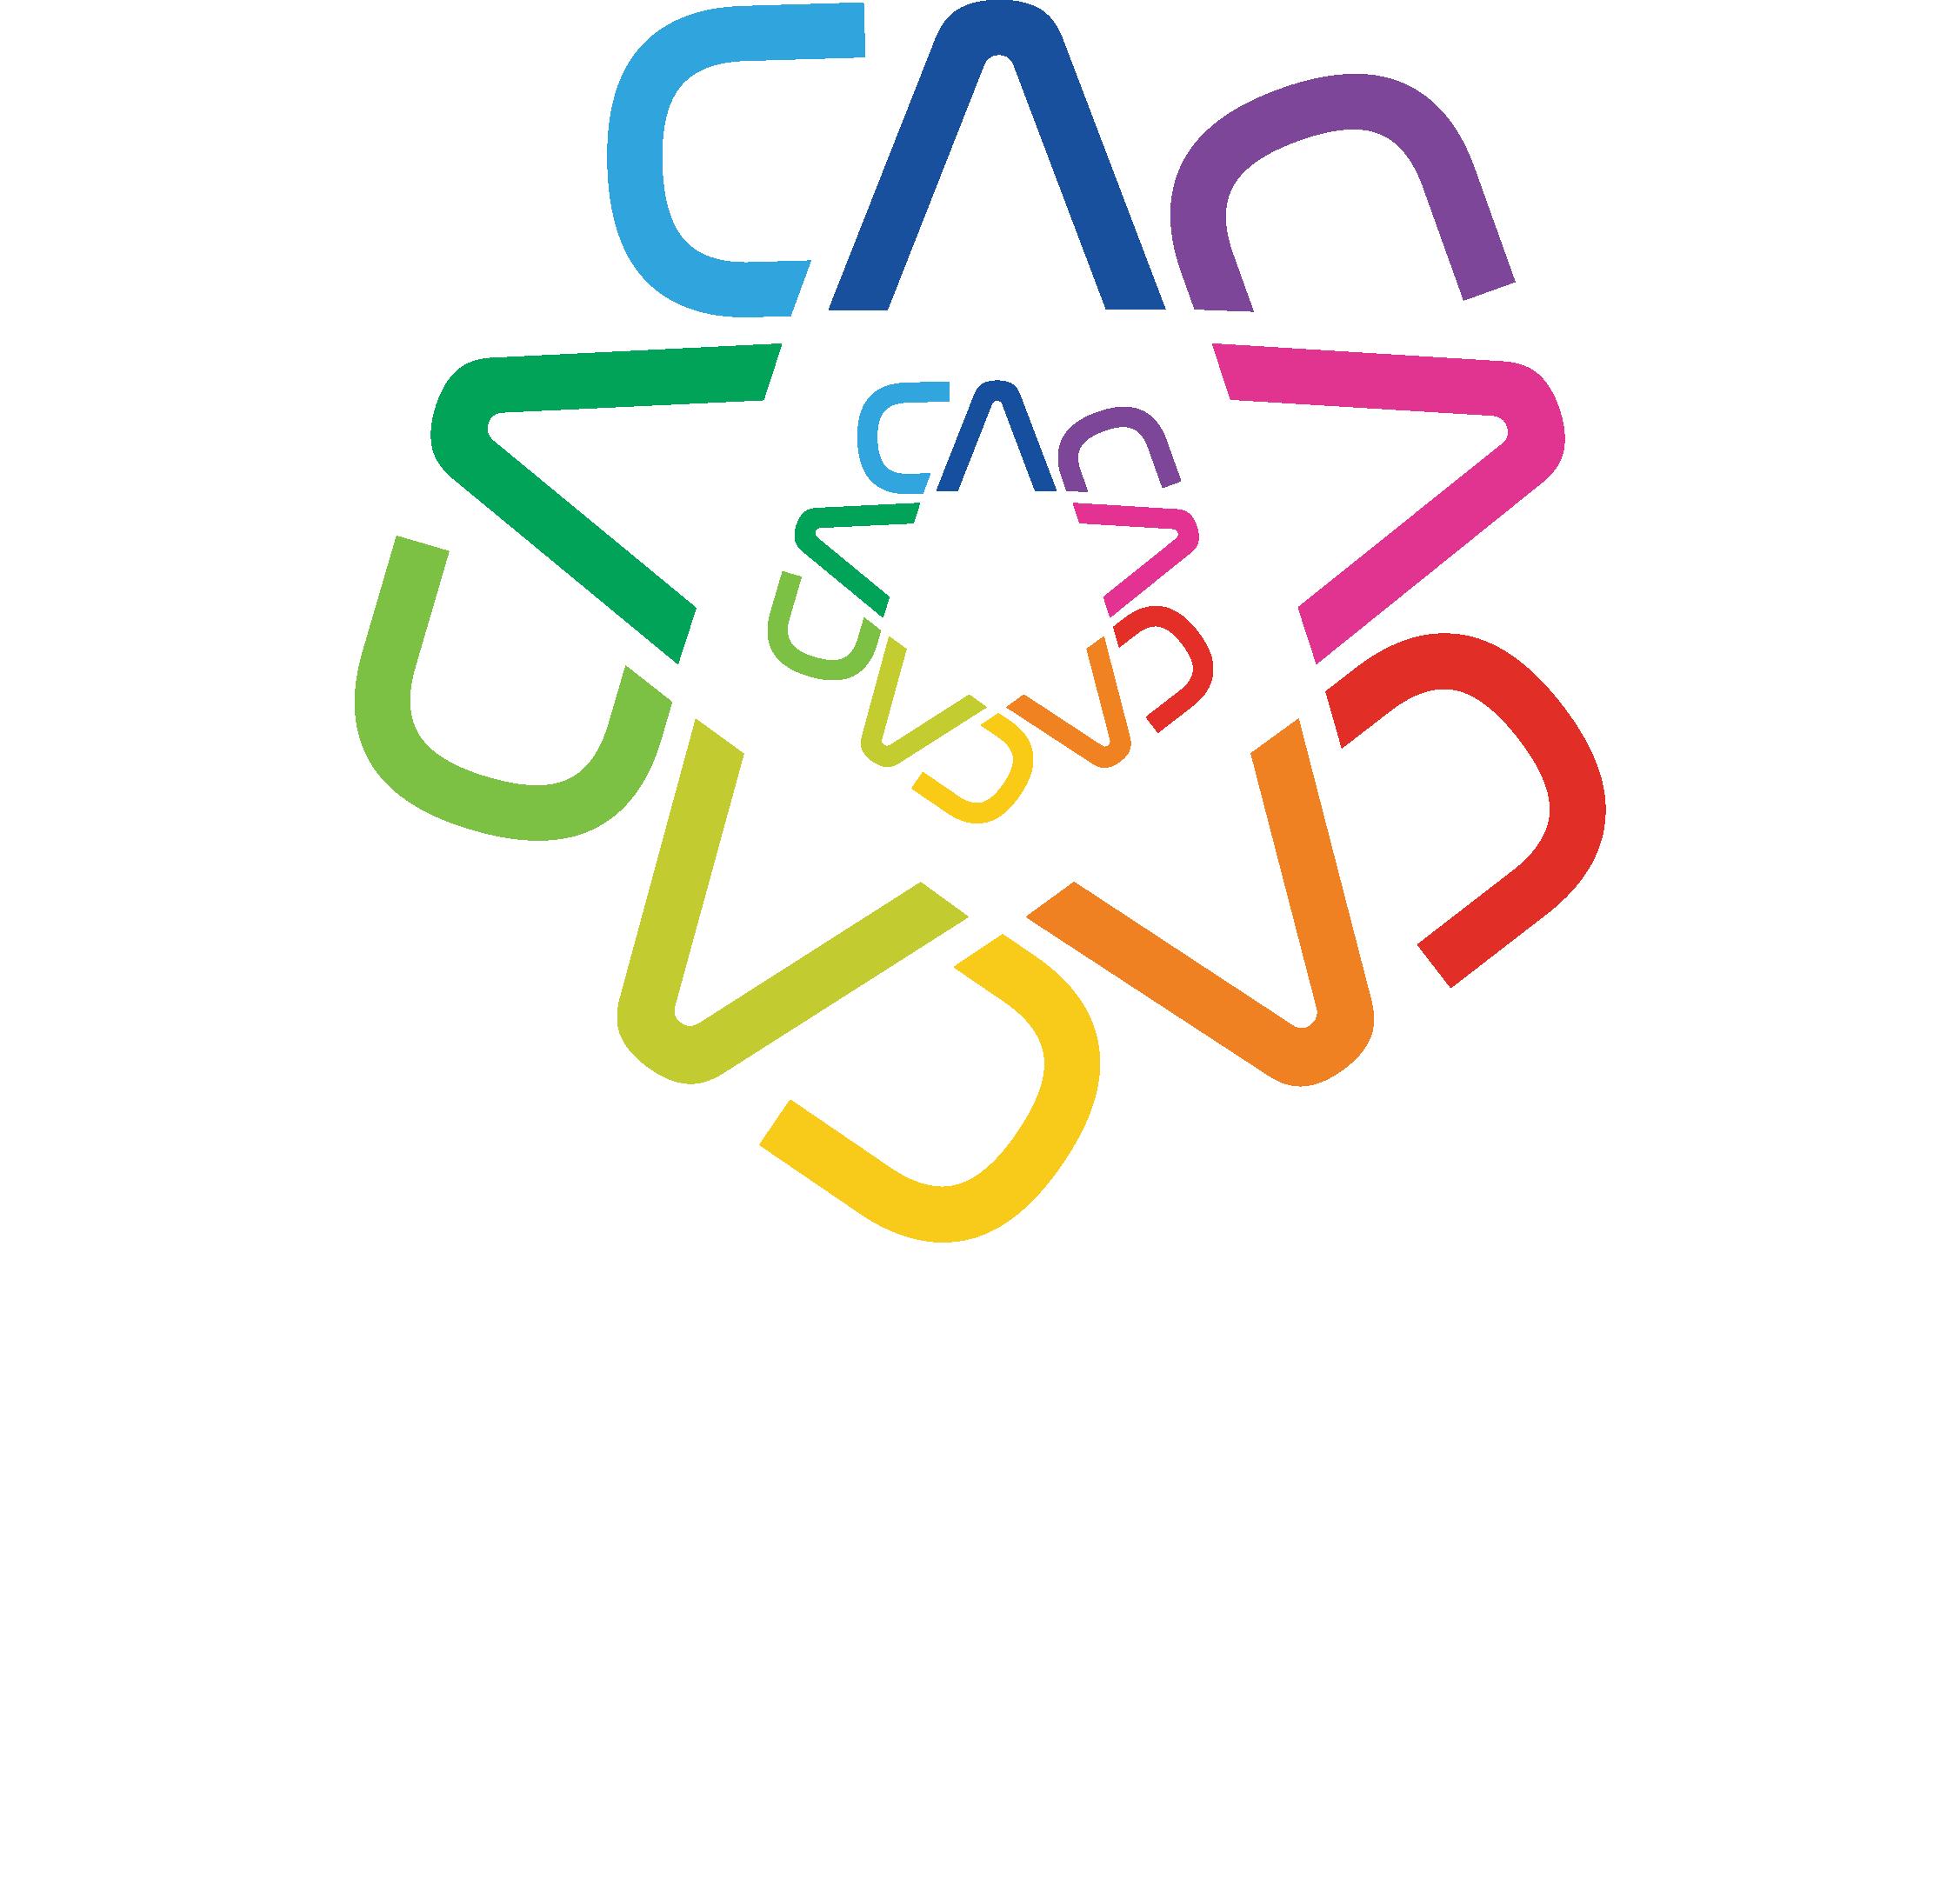 Create a gotcha logo to elevate STAR of CA